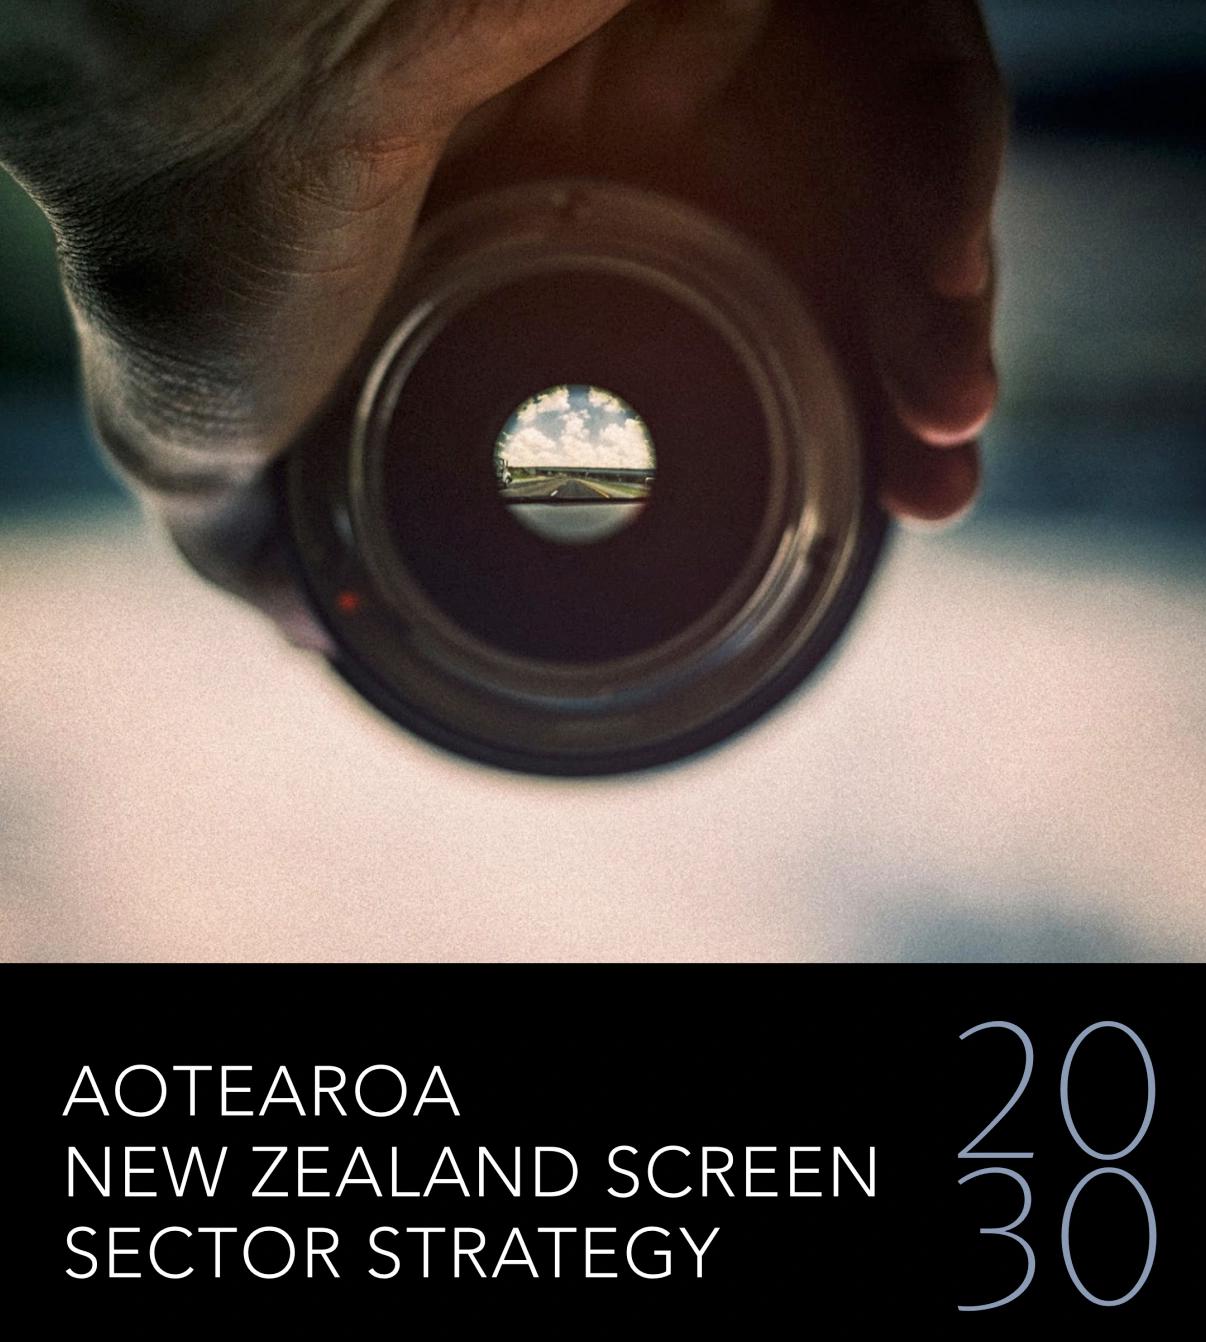 Aotearoa New Zealand Screen Sector Strategy 2030 Released